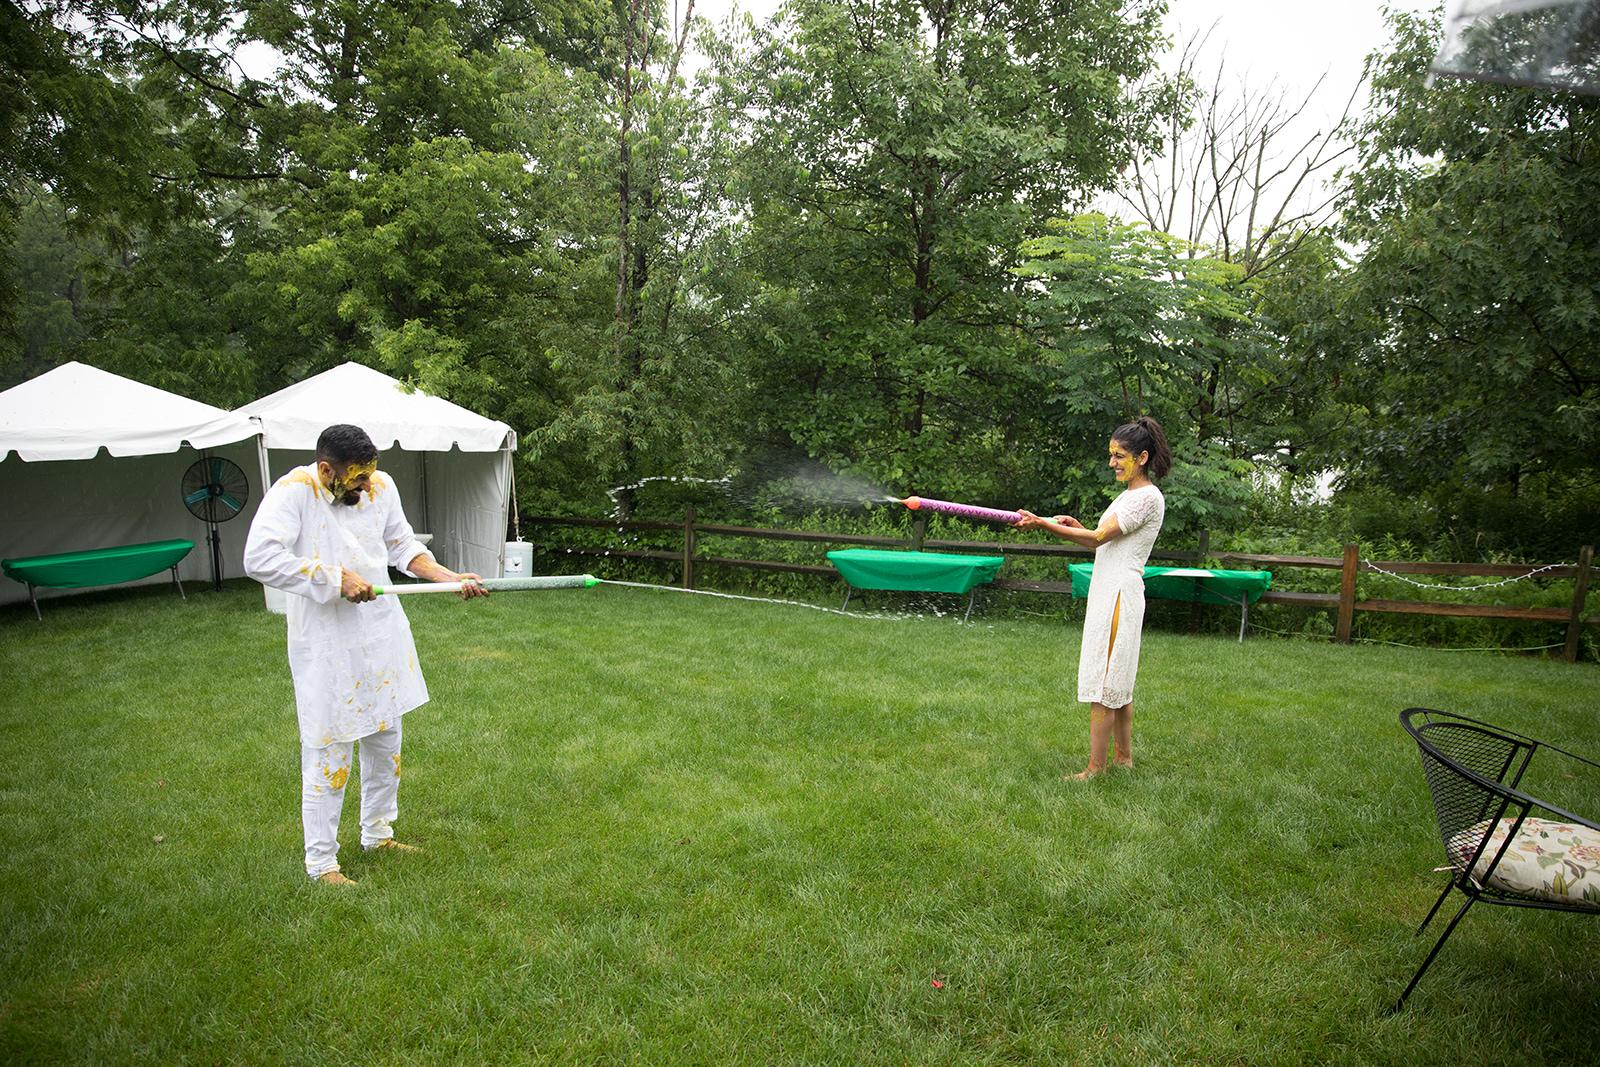 Le Cape Weddings - Sumeet and Chavi - Pithi-6-2.jpg